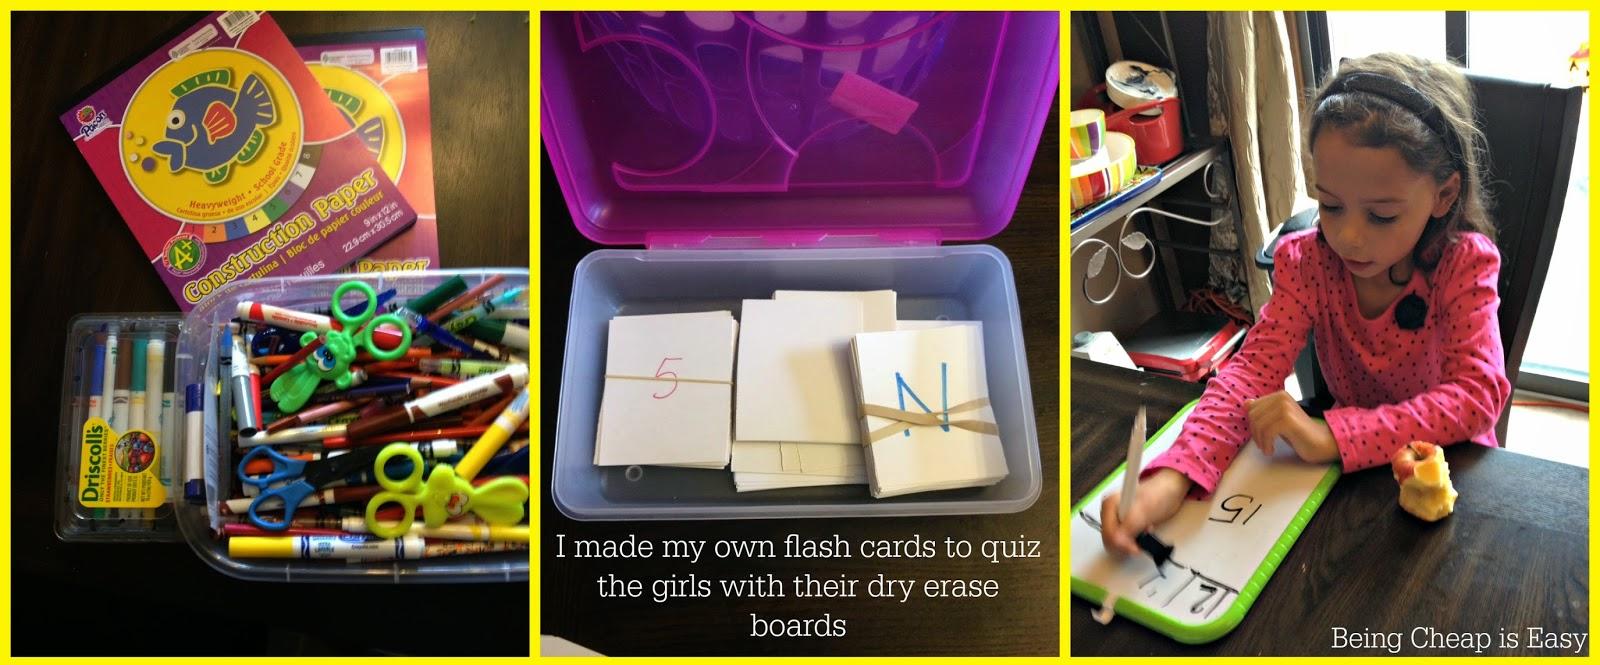 Kindergarten, Homework, Budget Friendly School Supplies,Being Cheap is Easy